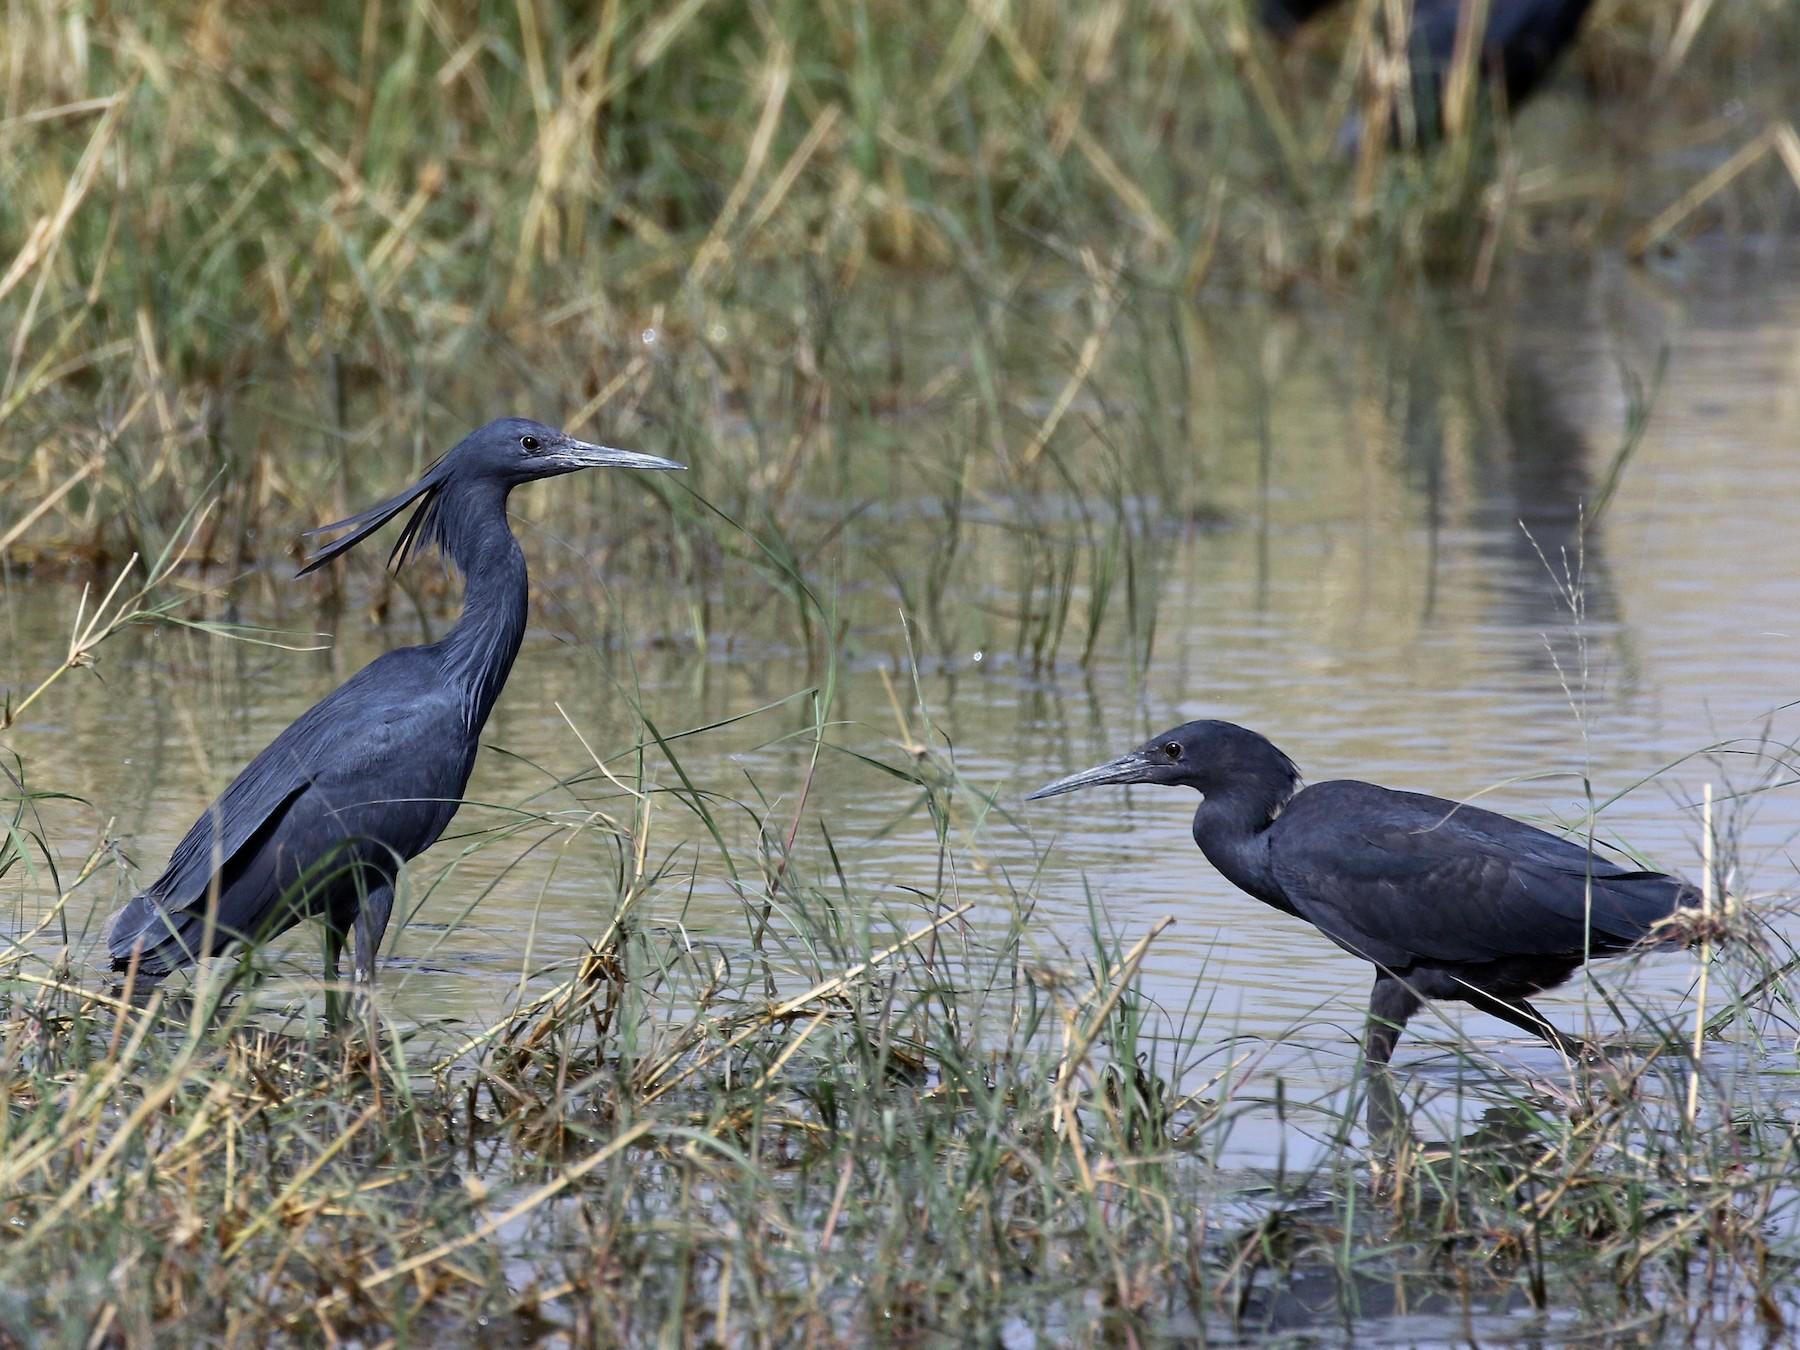 Black Heron - Jay McGowan